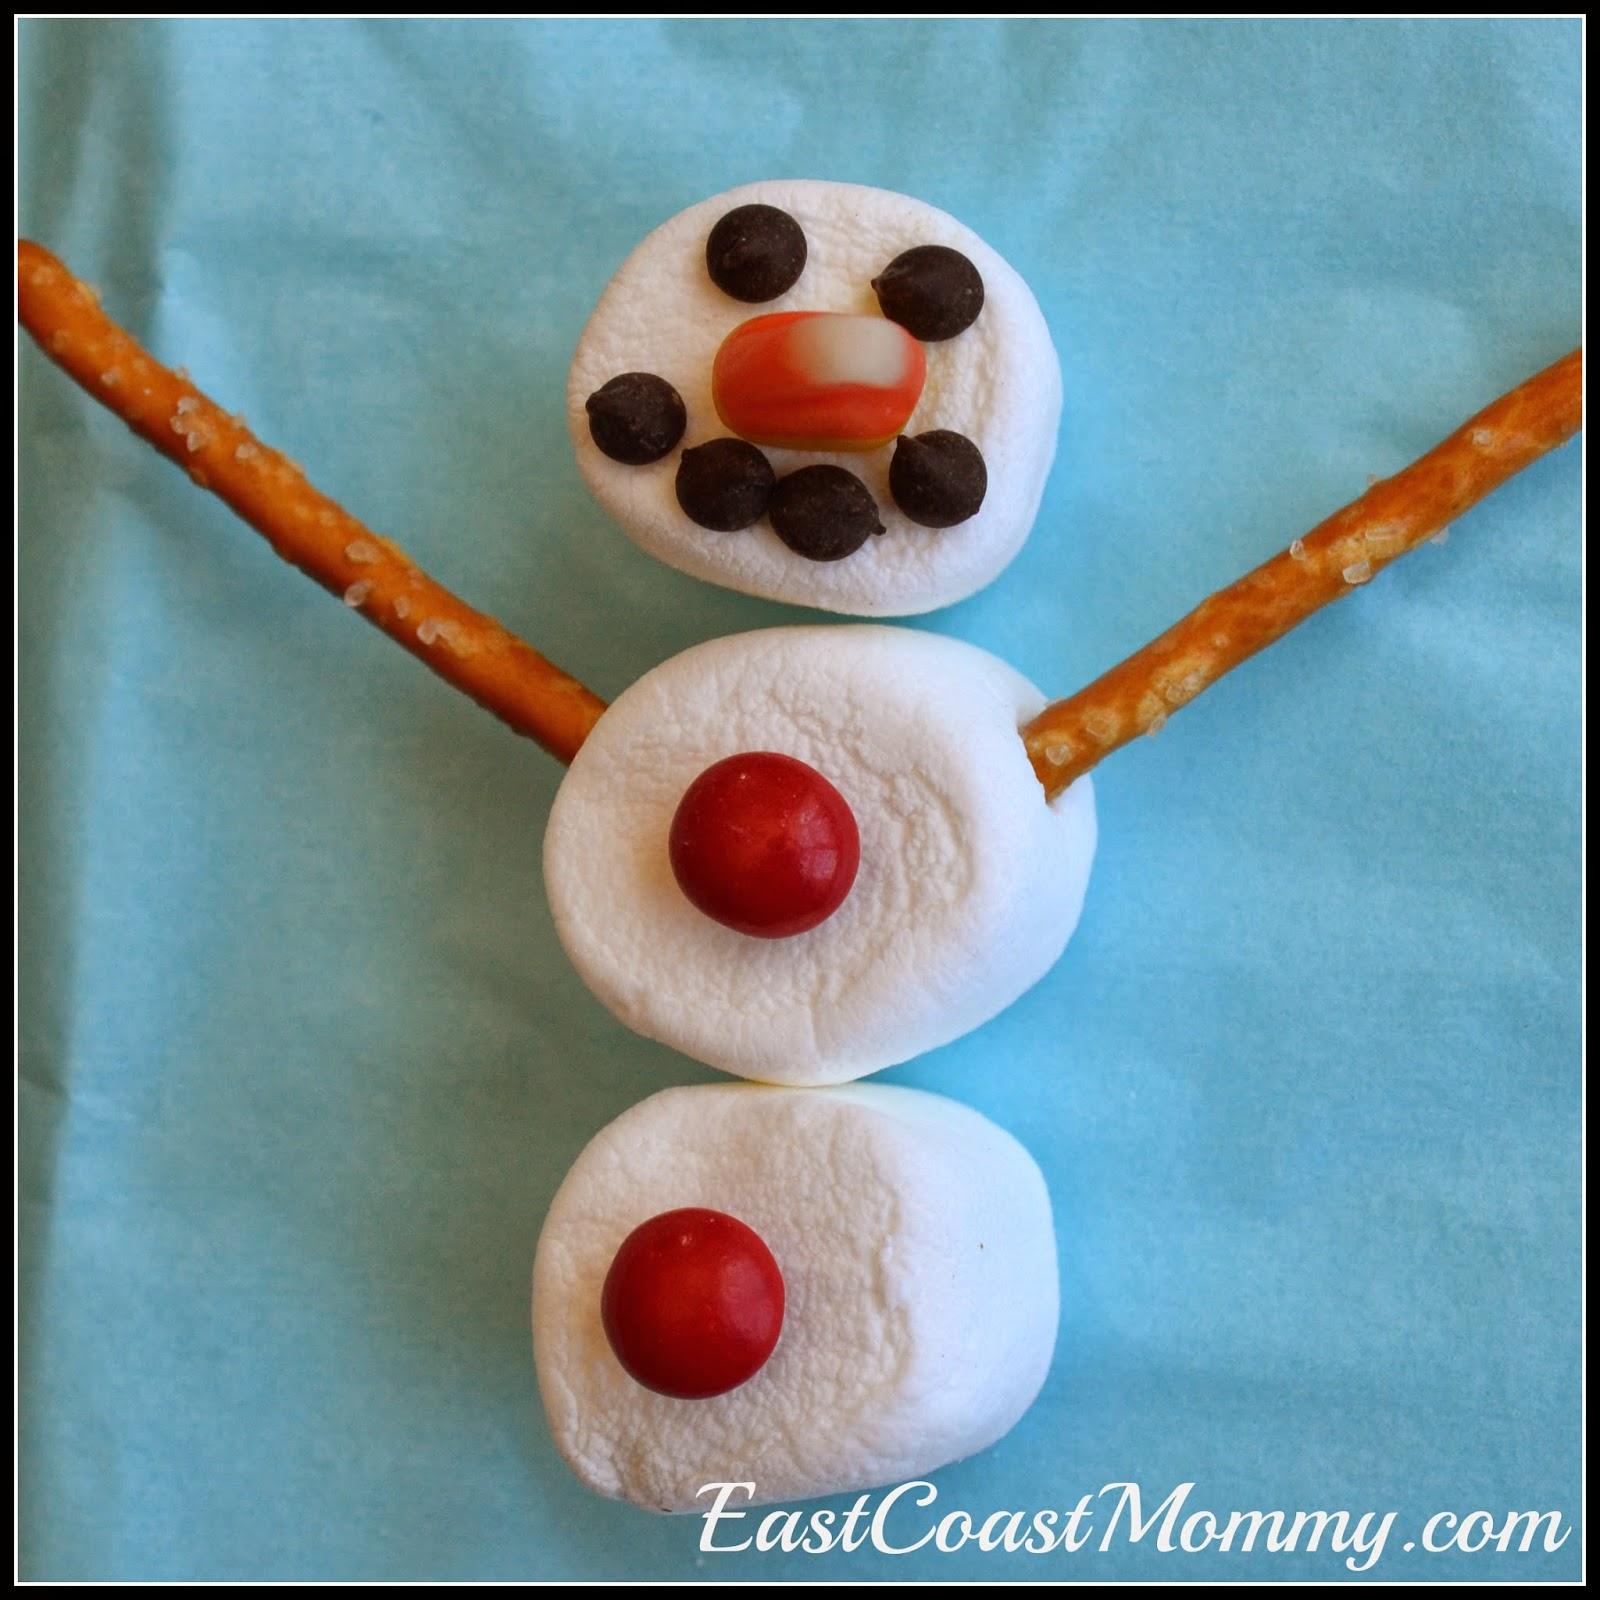 Three Fun Candy Corn Crafts for the Preschool Class